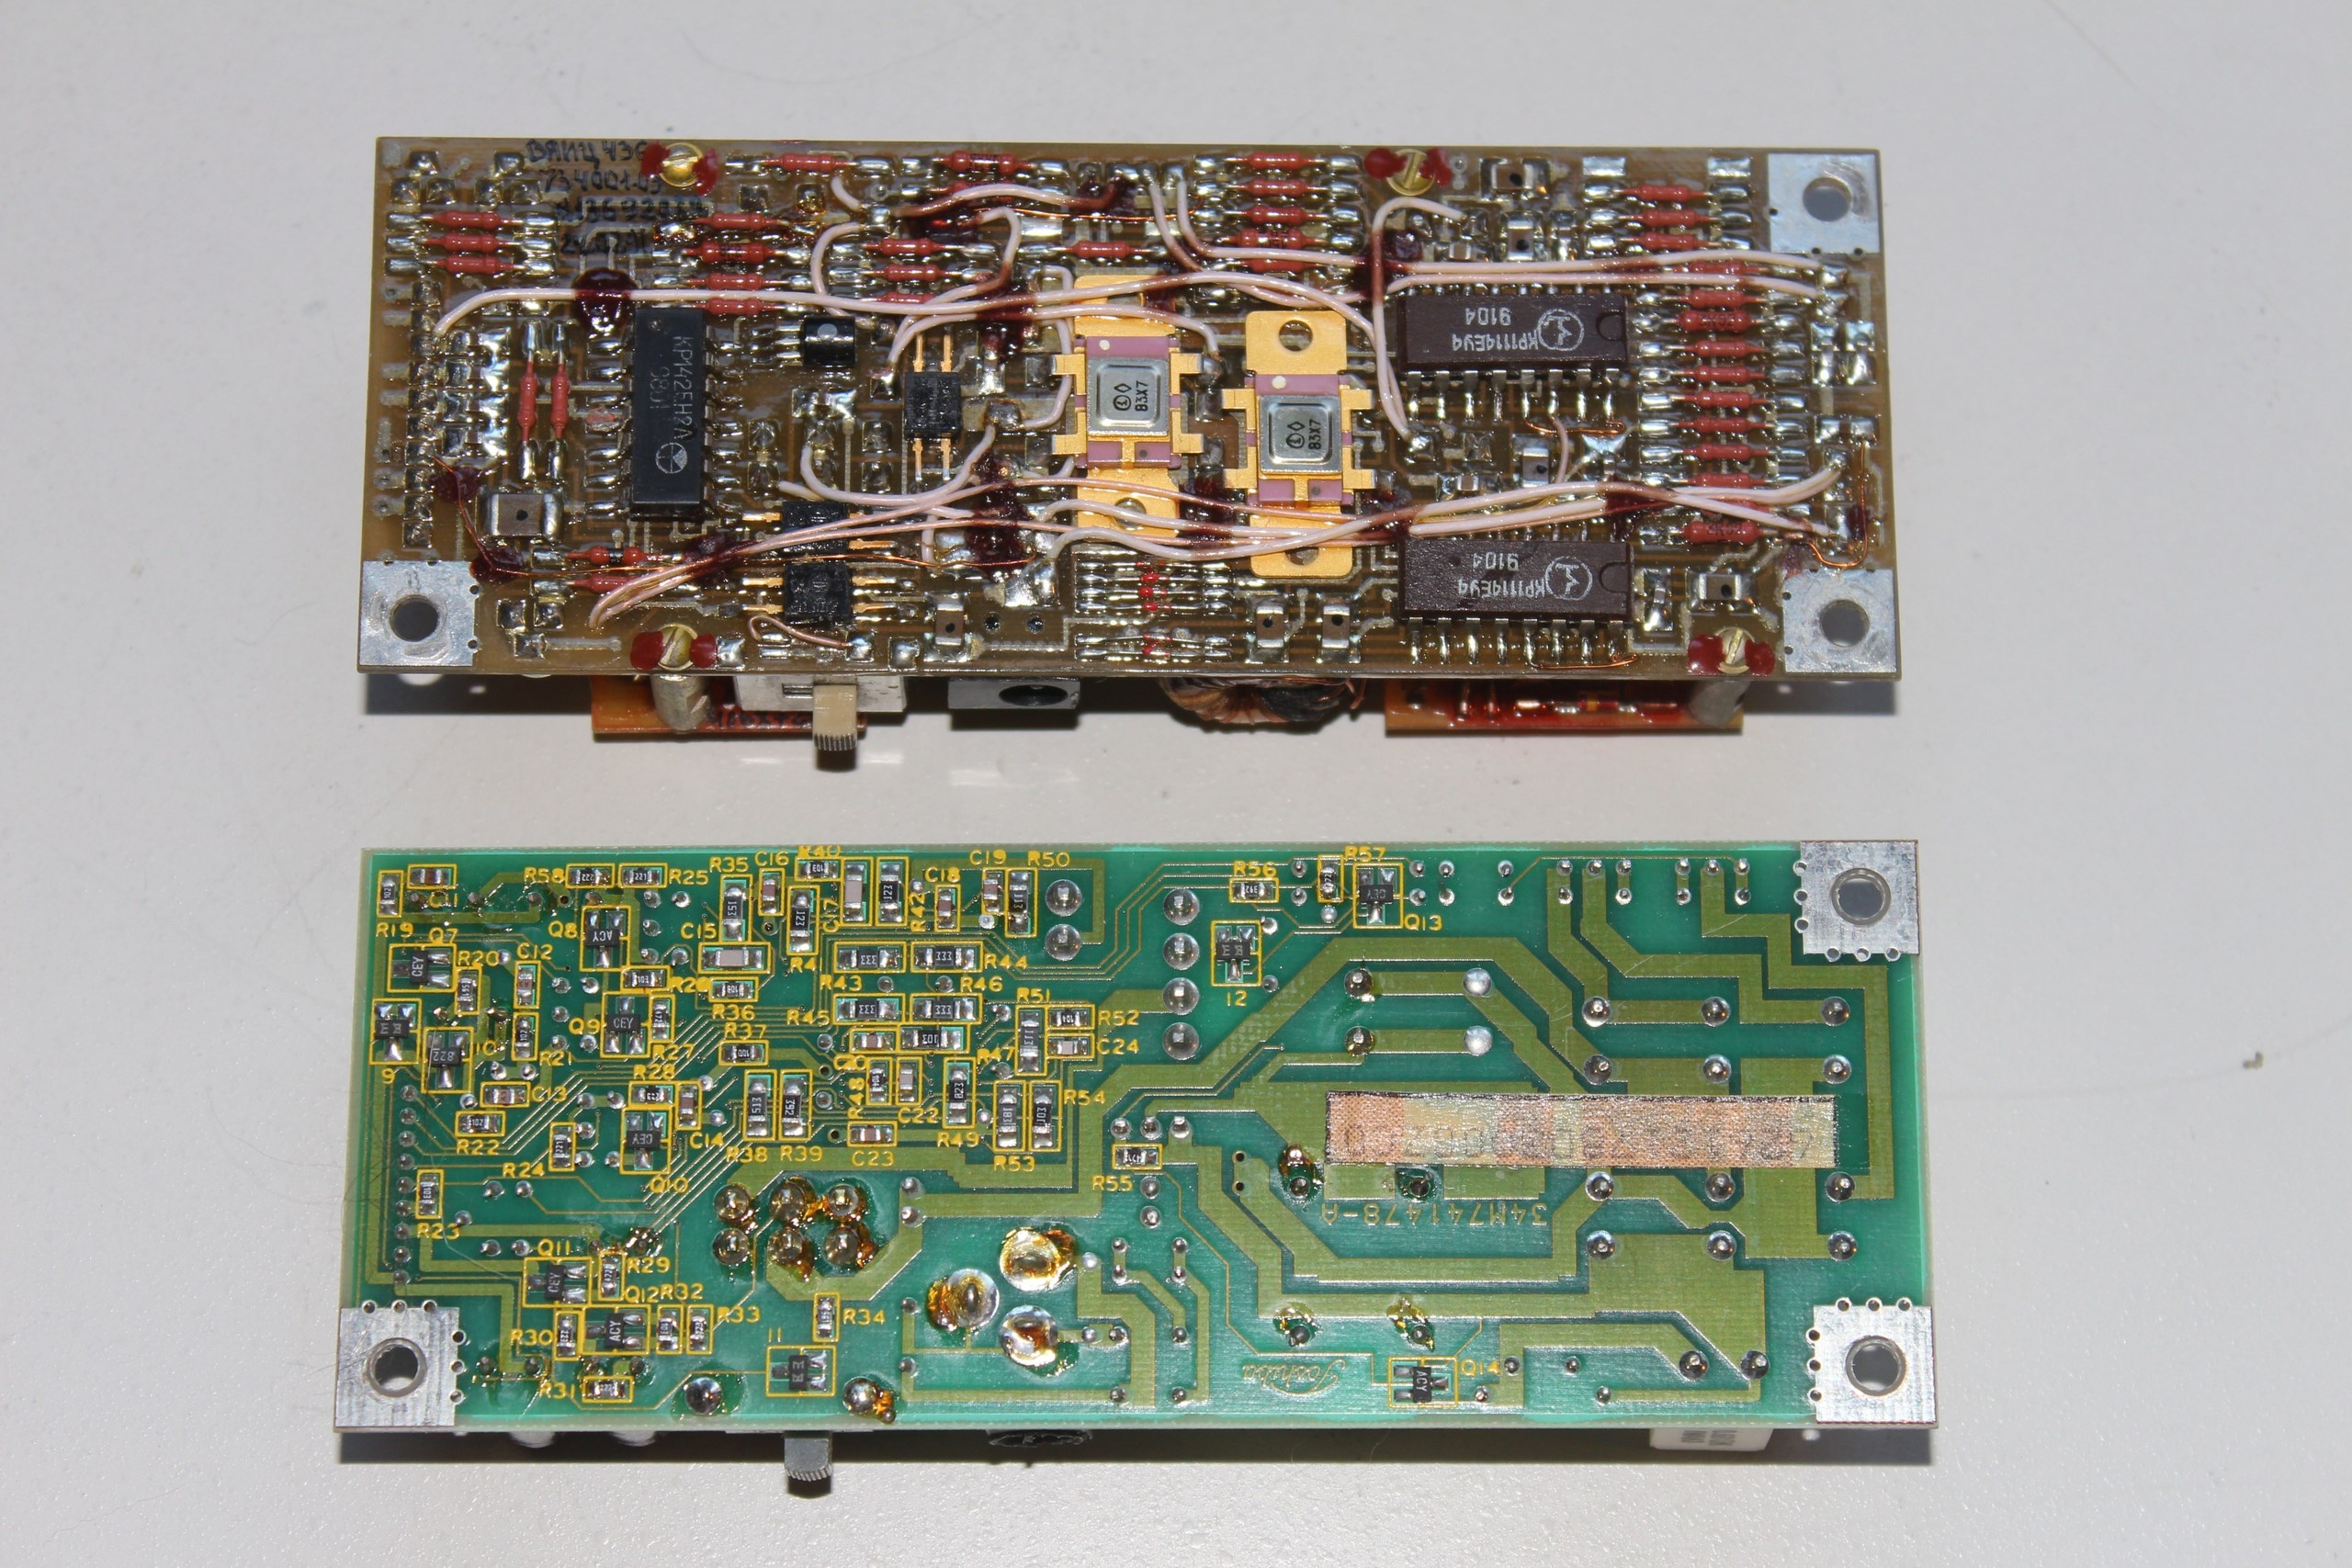 Модули стабилизатора Электроники и Тошибы - вид снизу